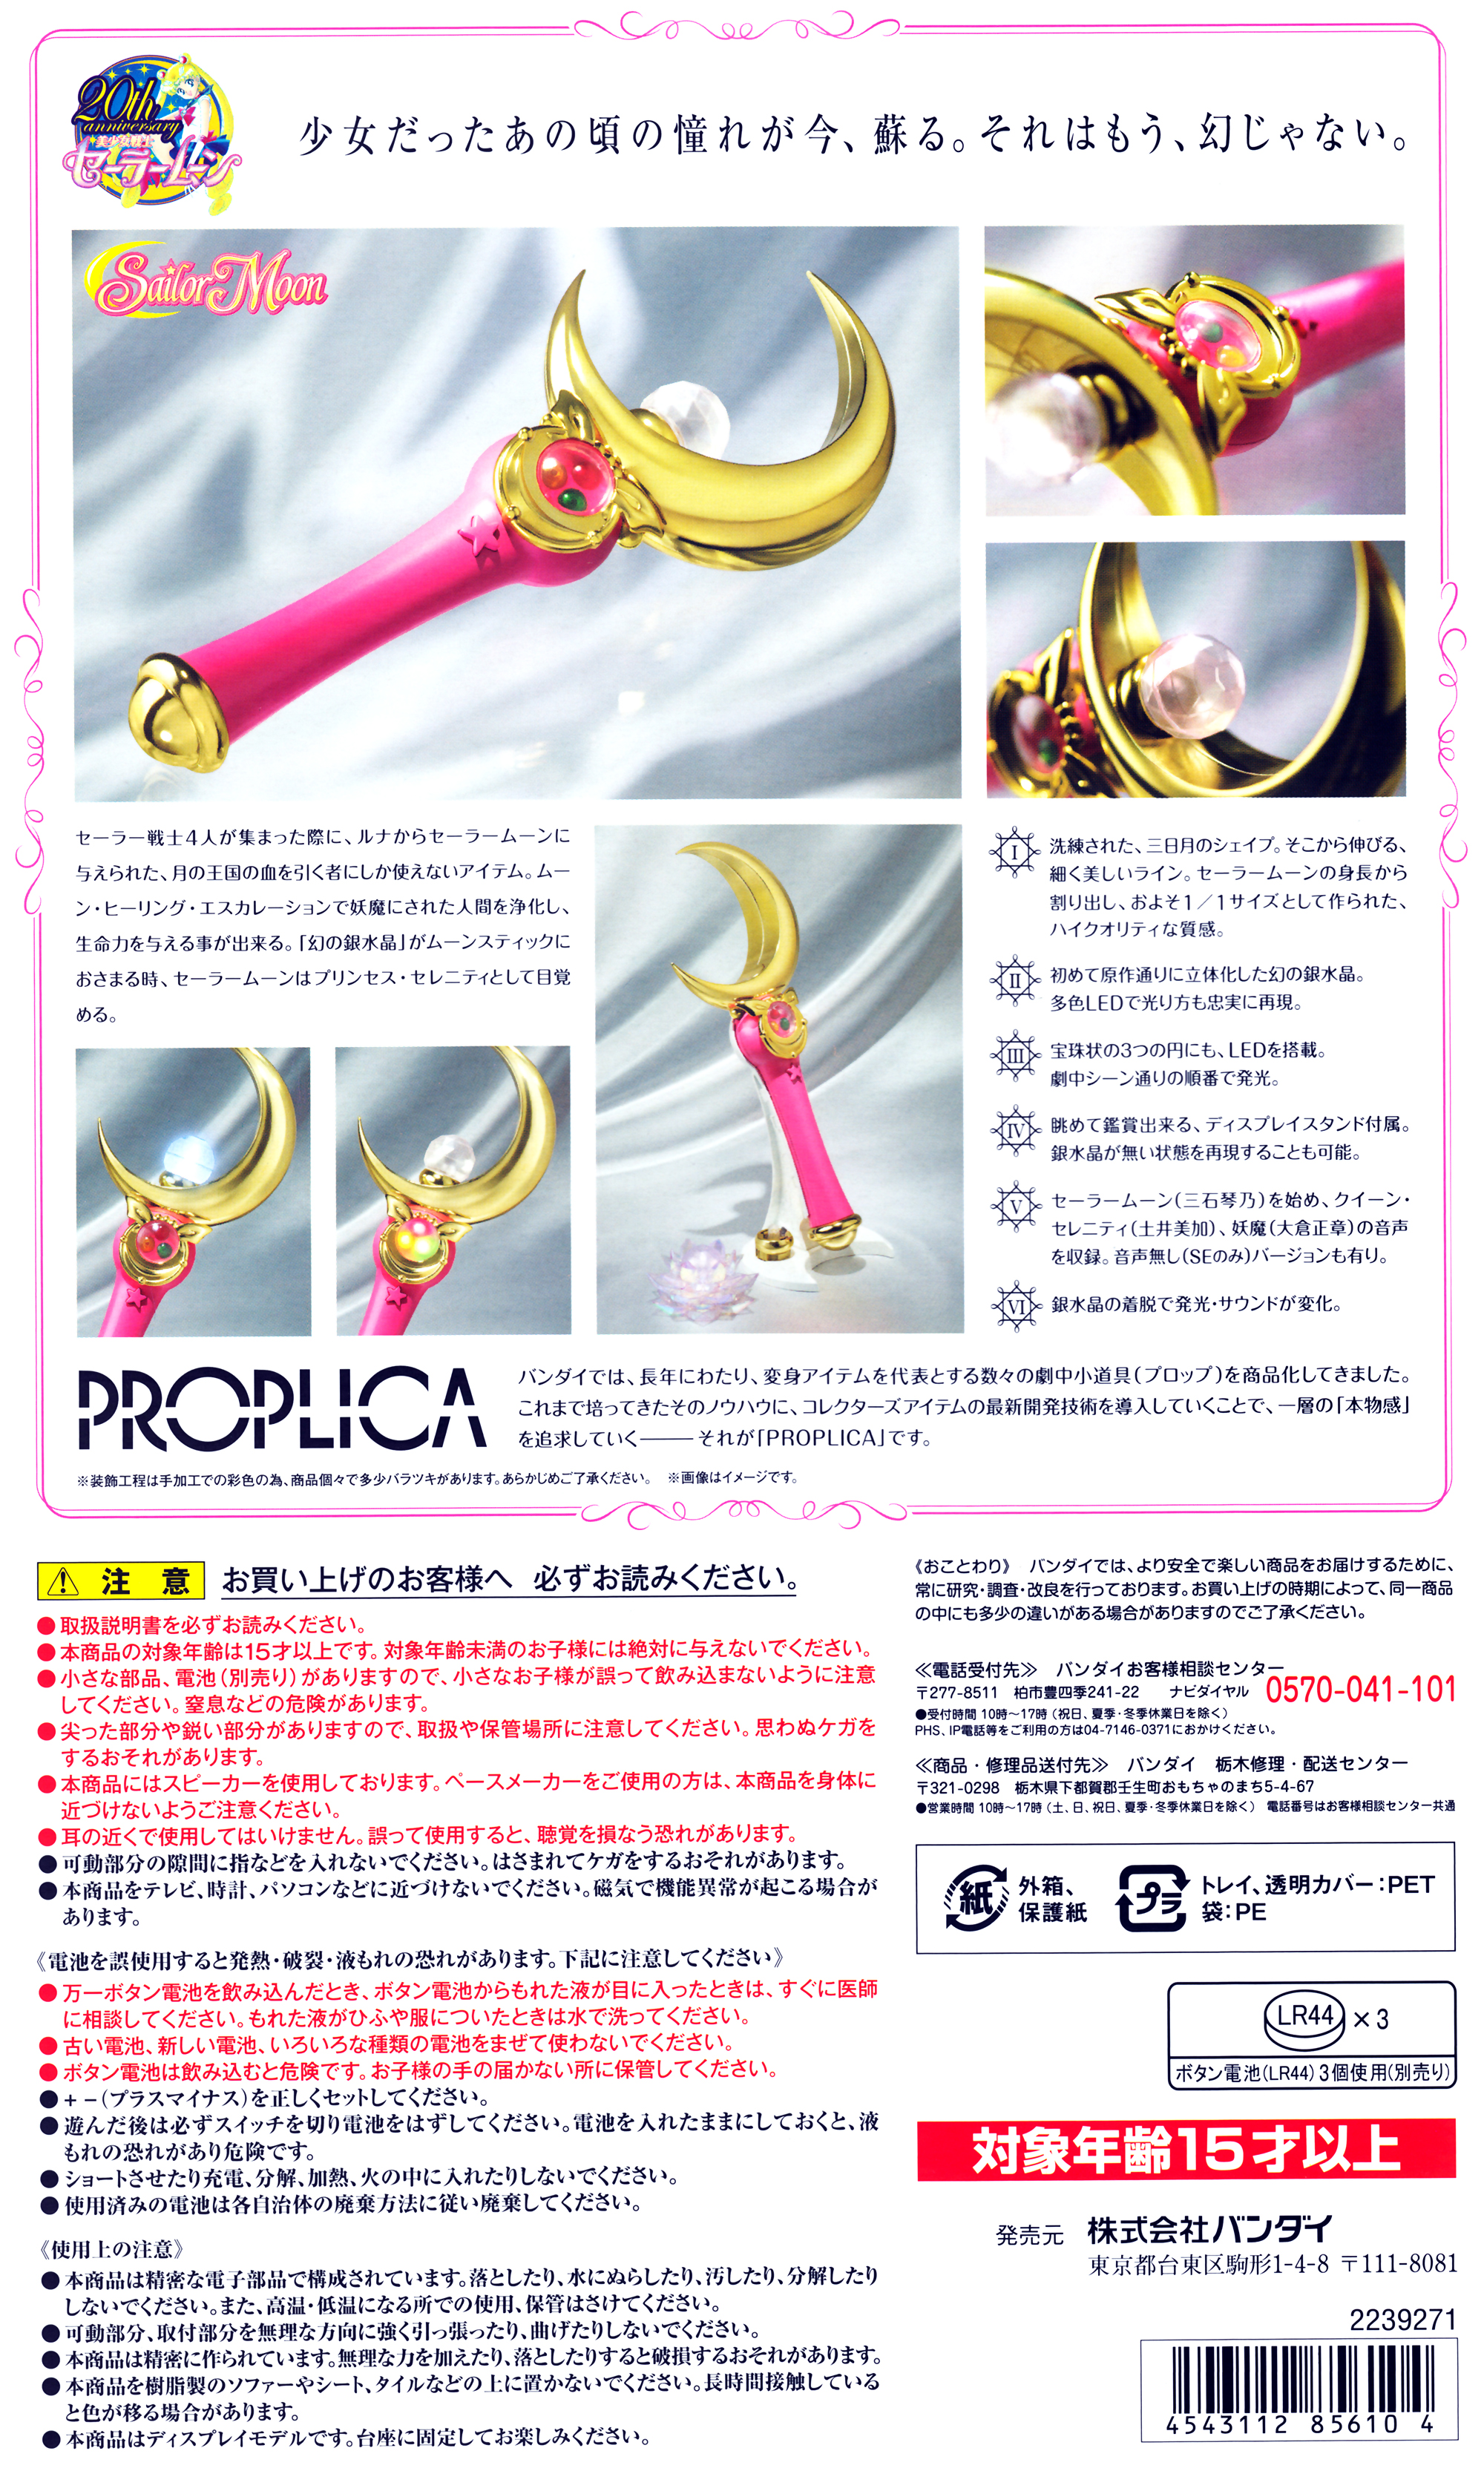 Proplica-moon-stick-02